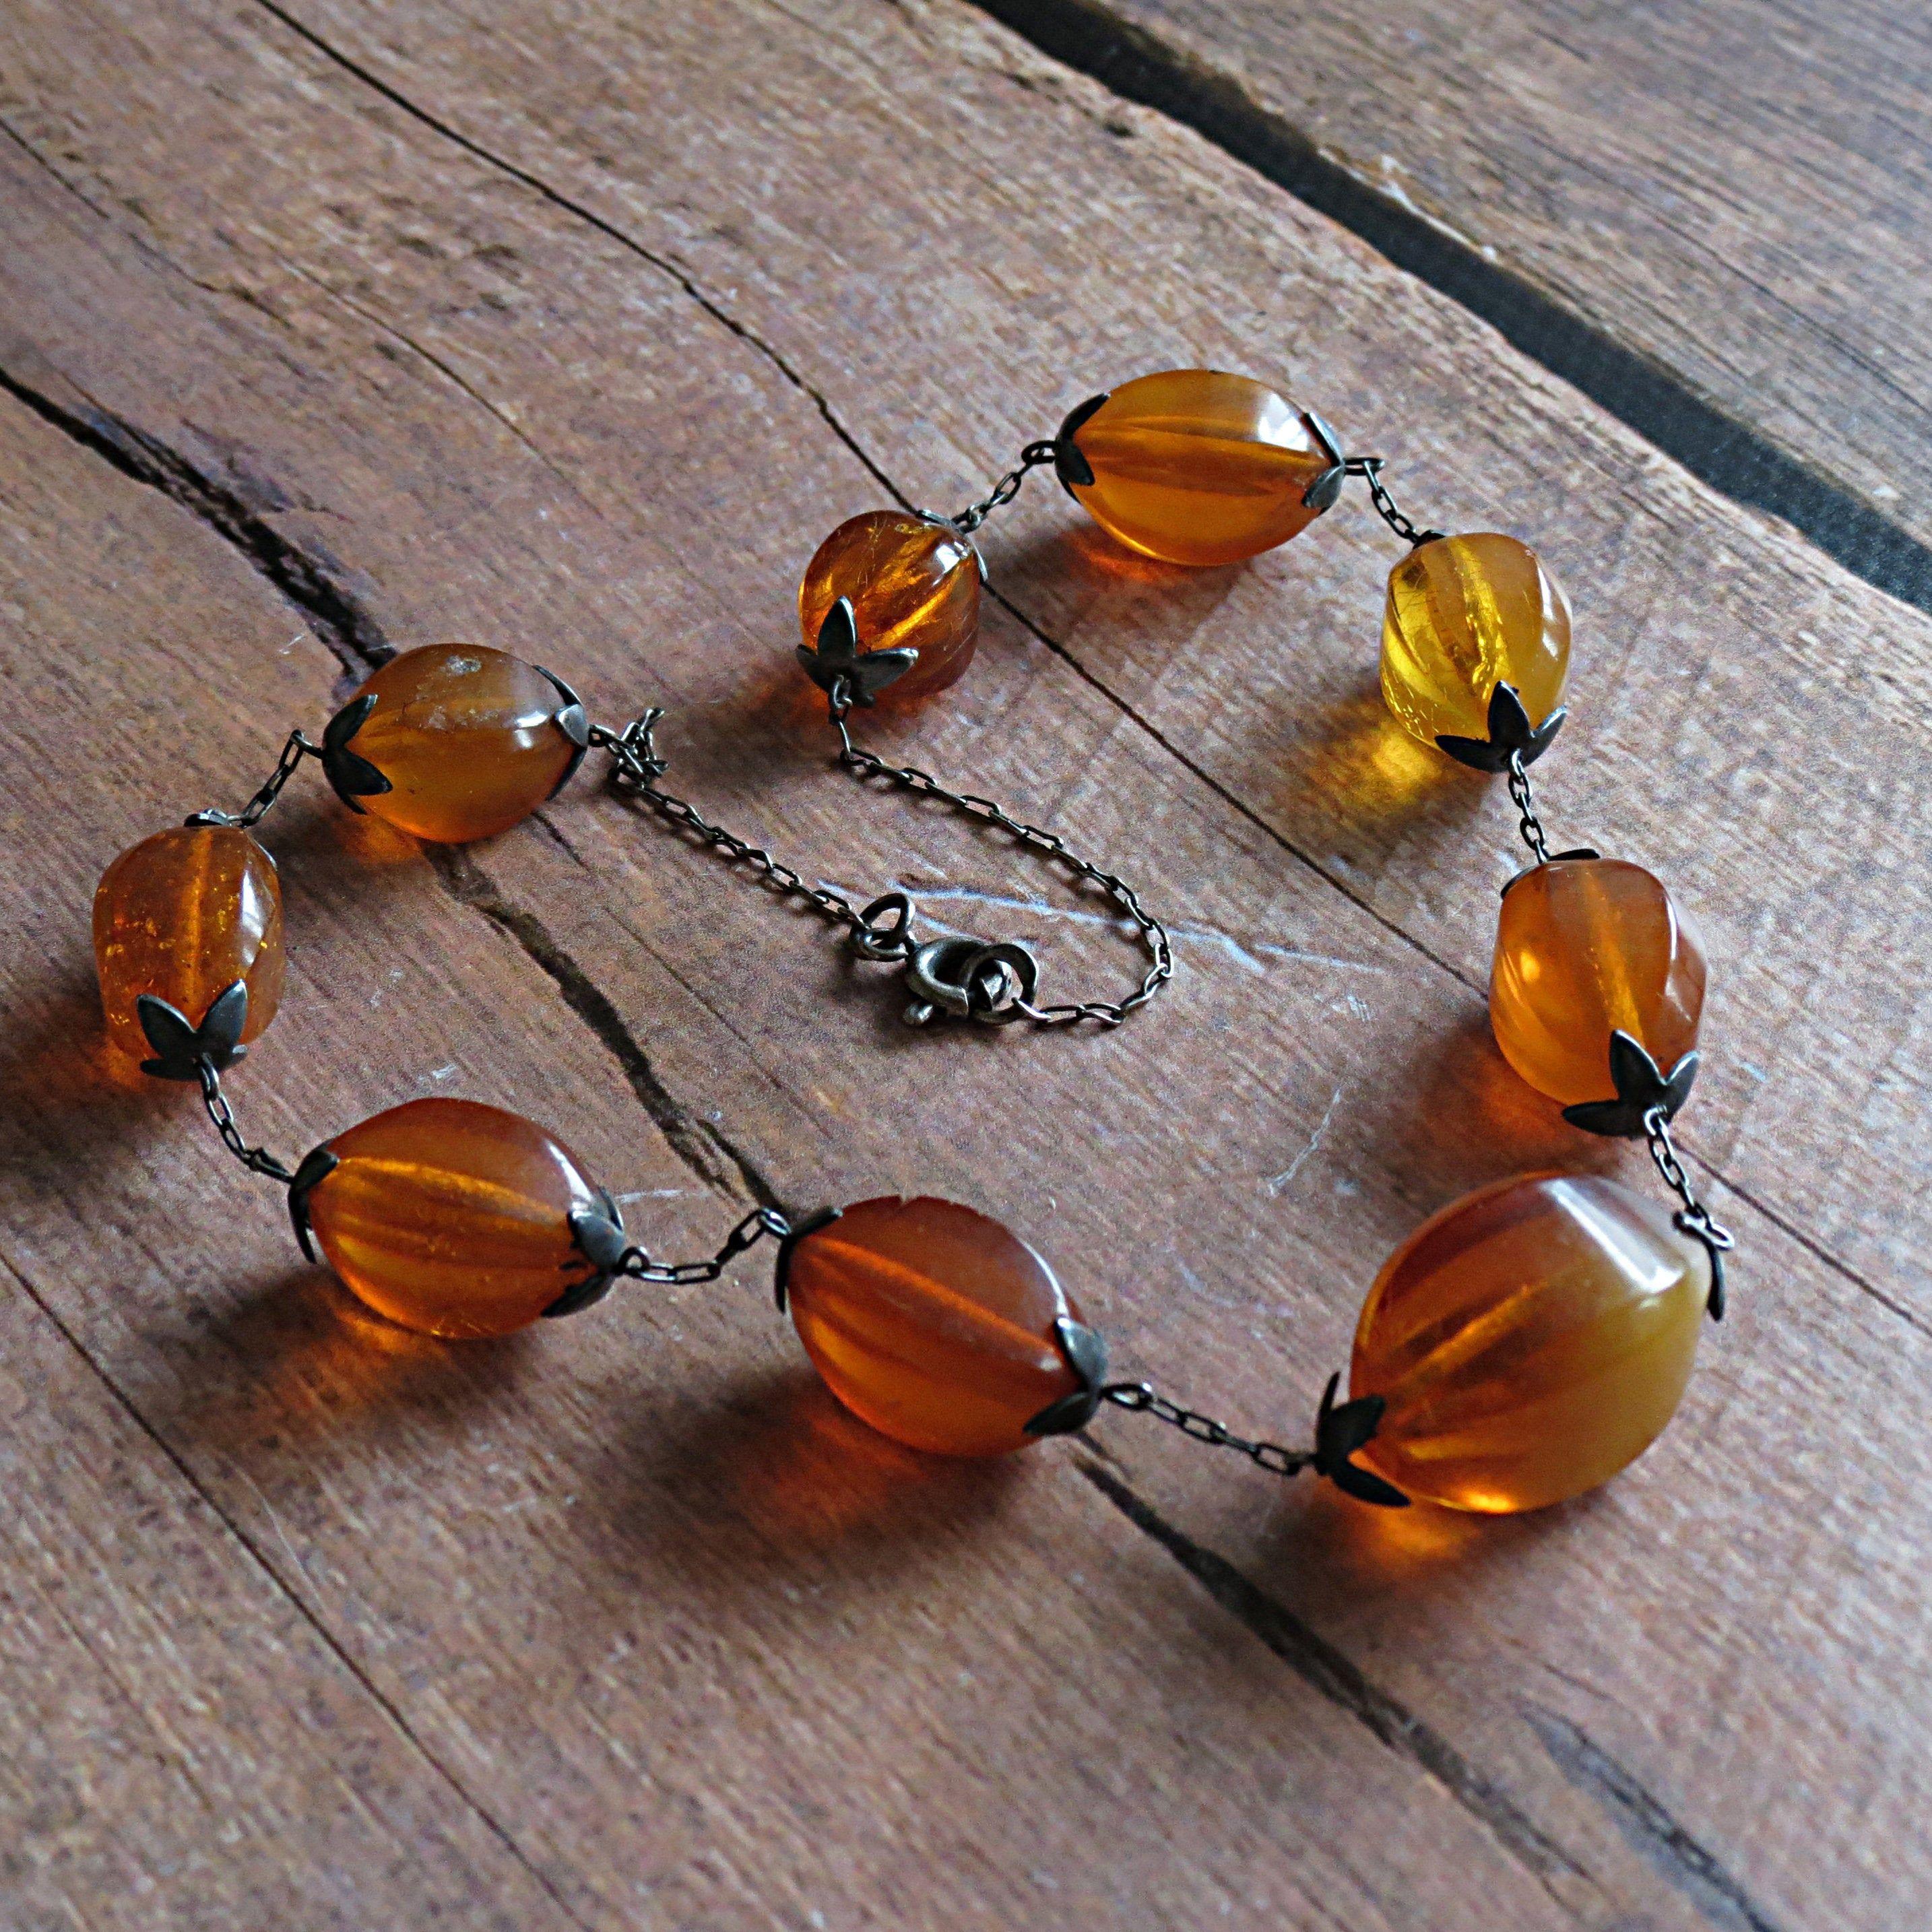 Vintage natural amber necklace Amber dangle Vintage amber gift.35 gr Vintage 1950s Cognac color amber necklace Old genuine baltic amber